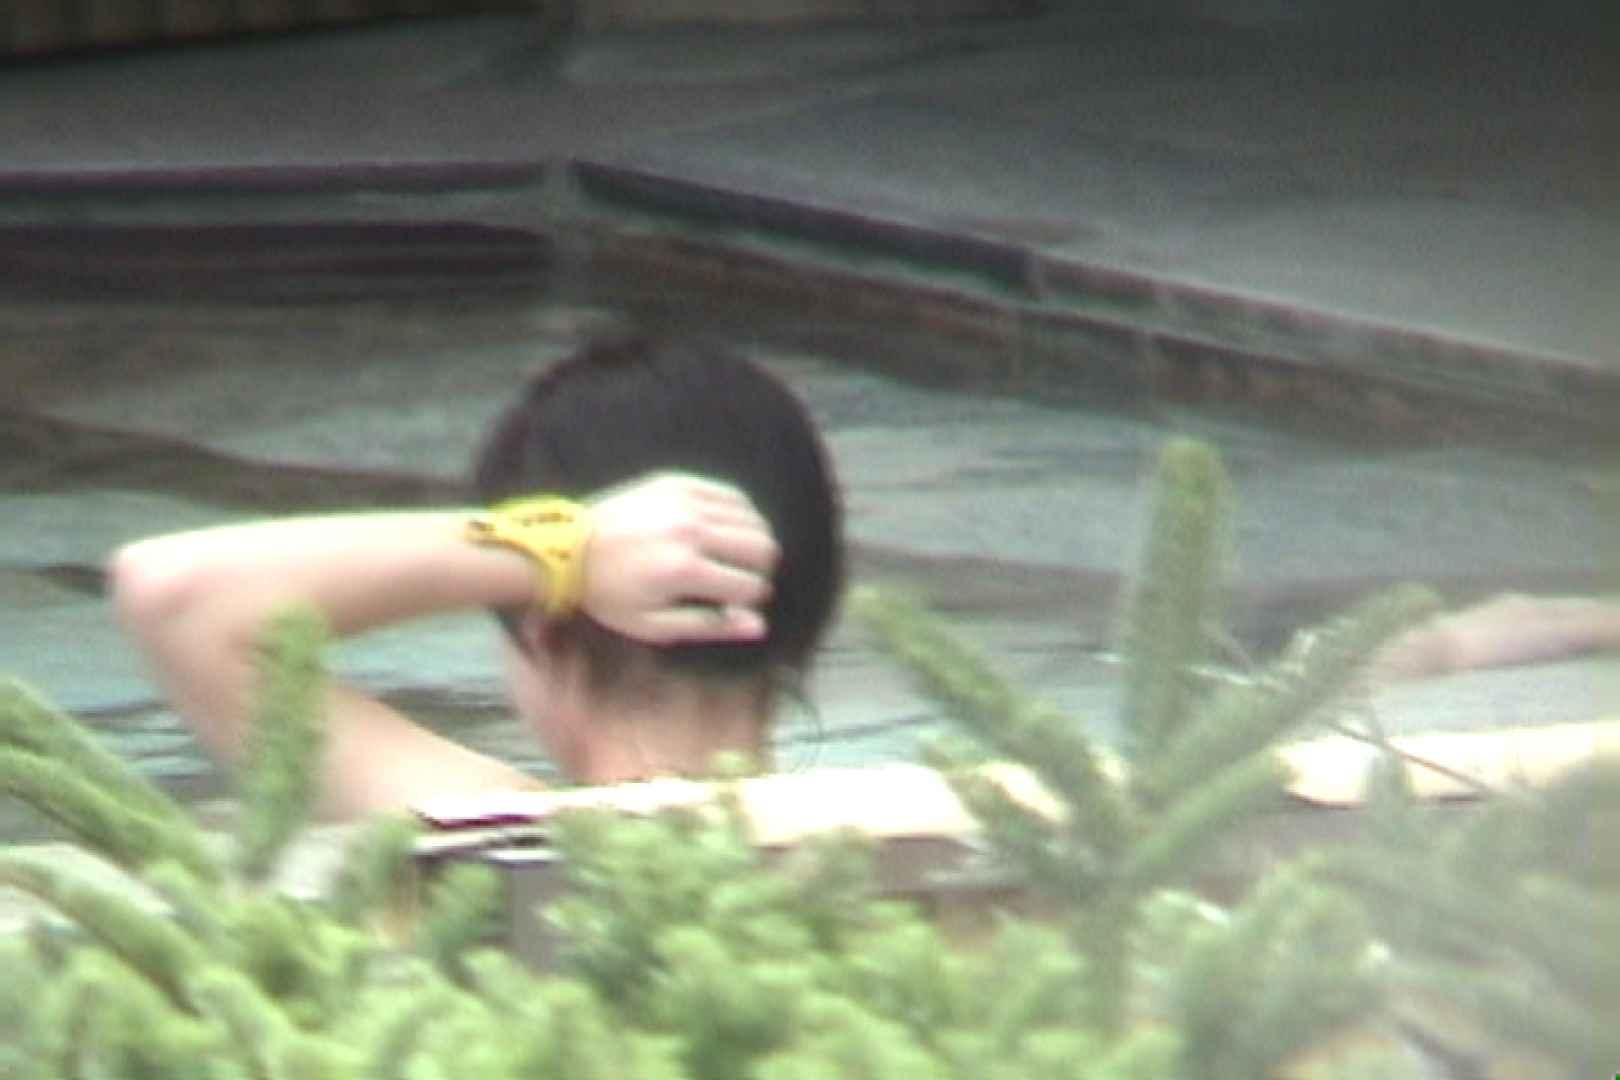 Aquaな露天風呂Vol.558 美しいOLの裸体 AV無料動画キャプチャ 86pic 2